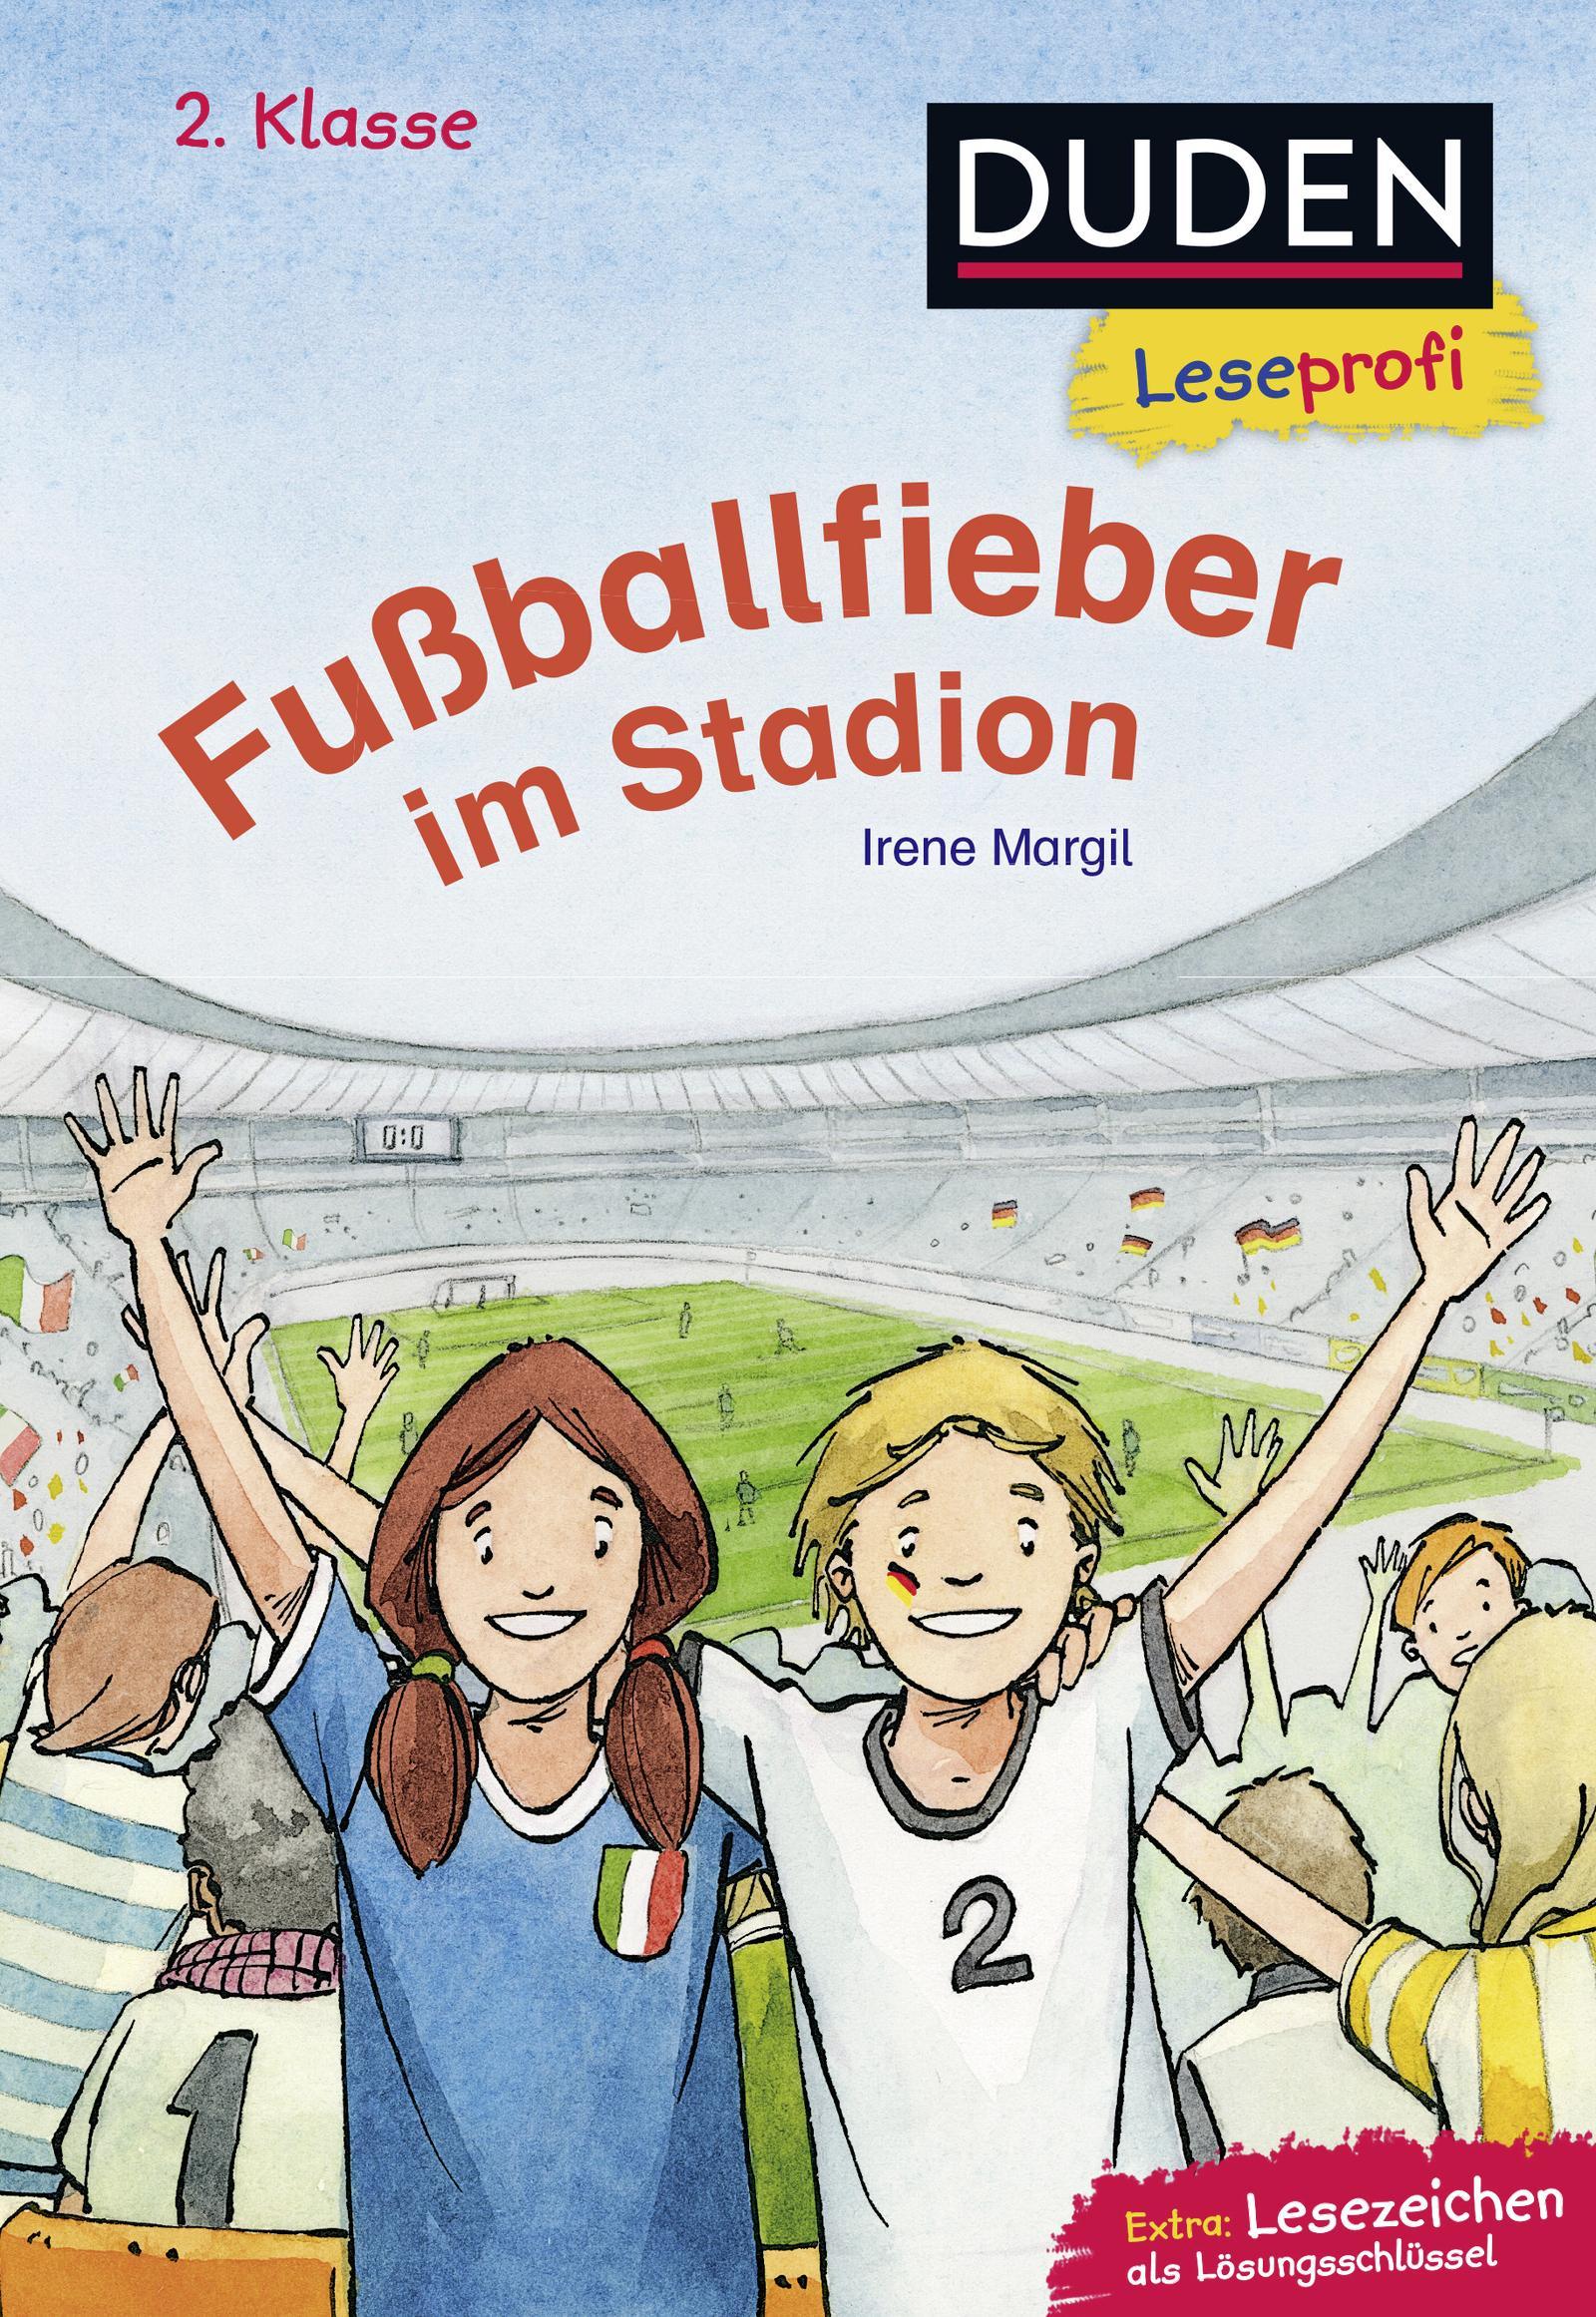 Leseprofi - Fußballfieber im Stadion, 2. Klasse, Irene Margil